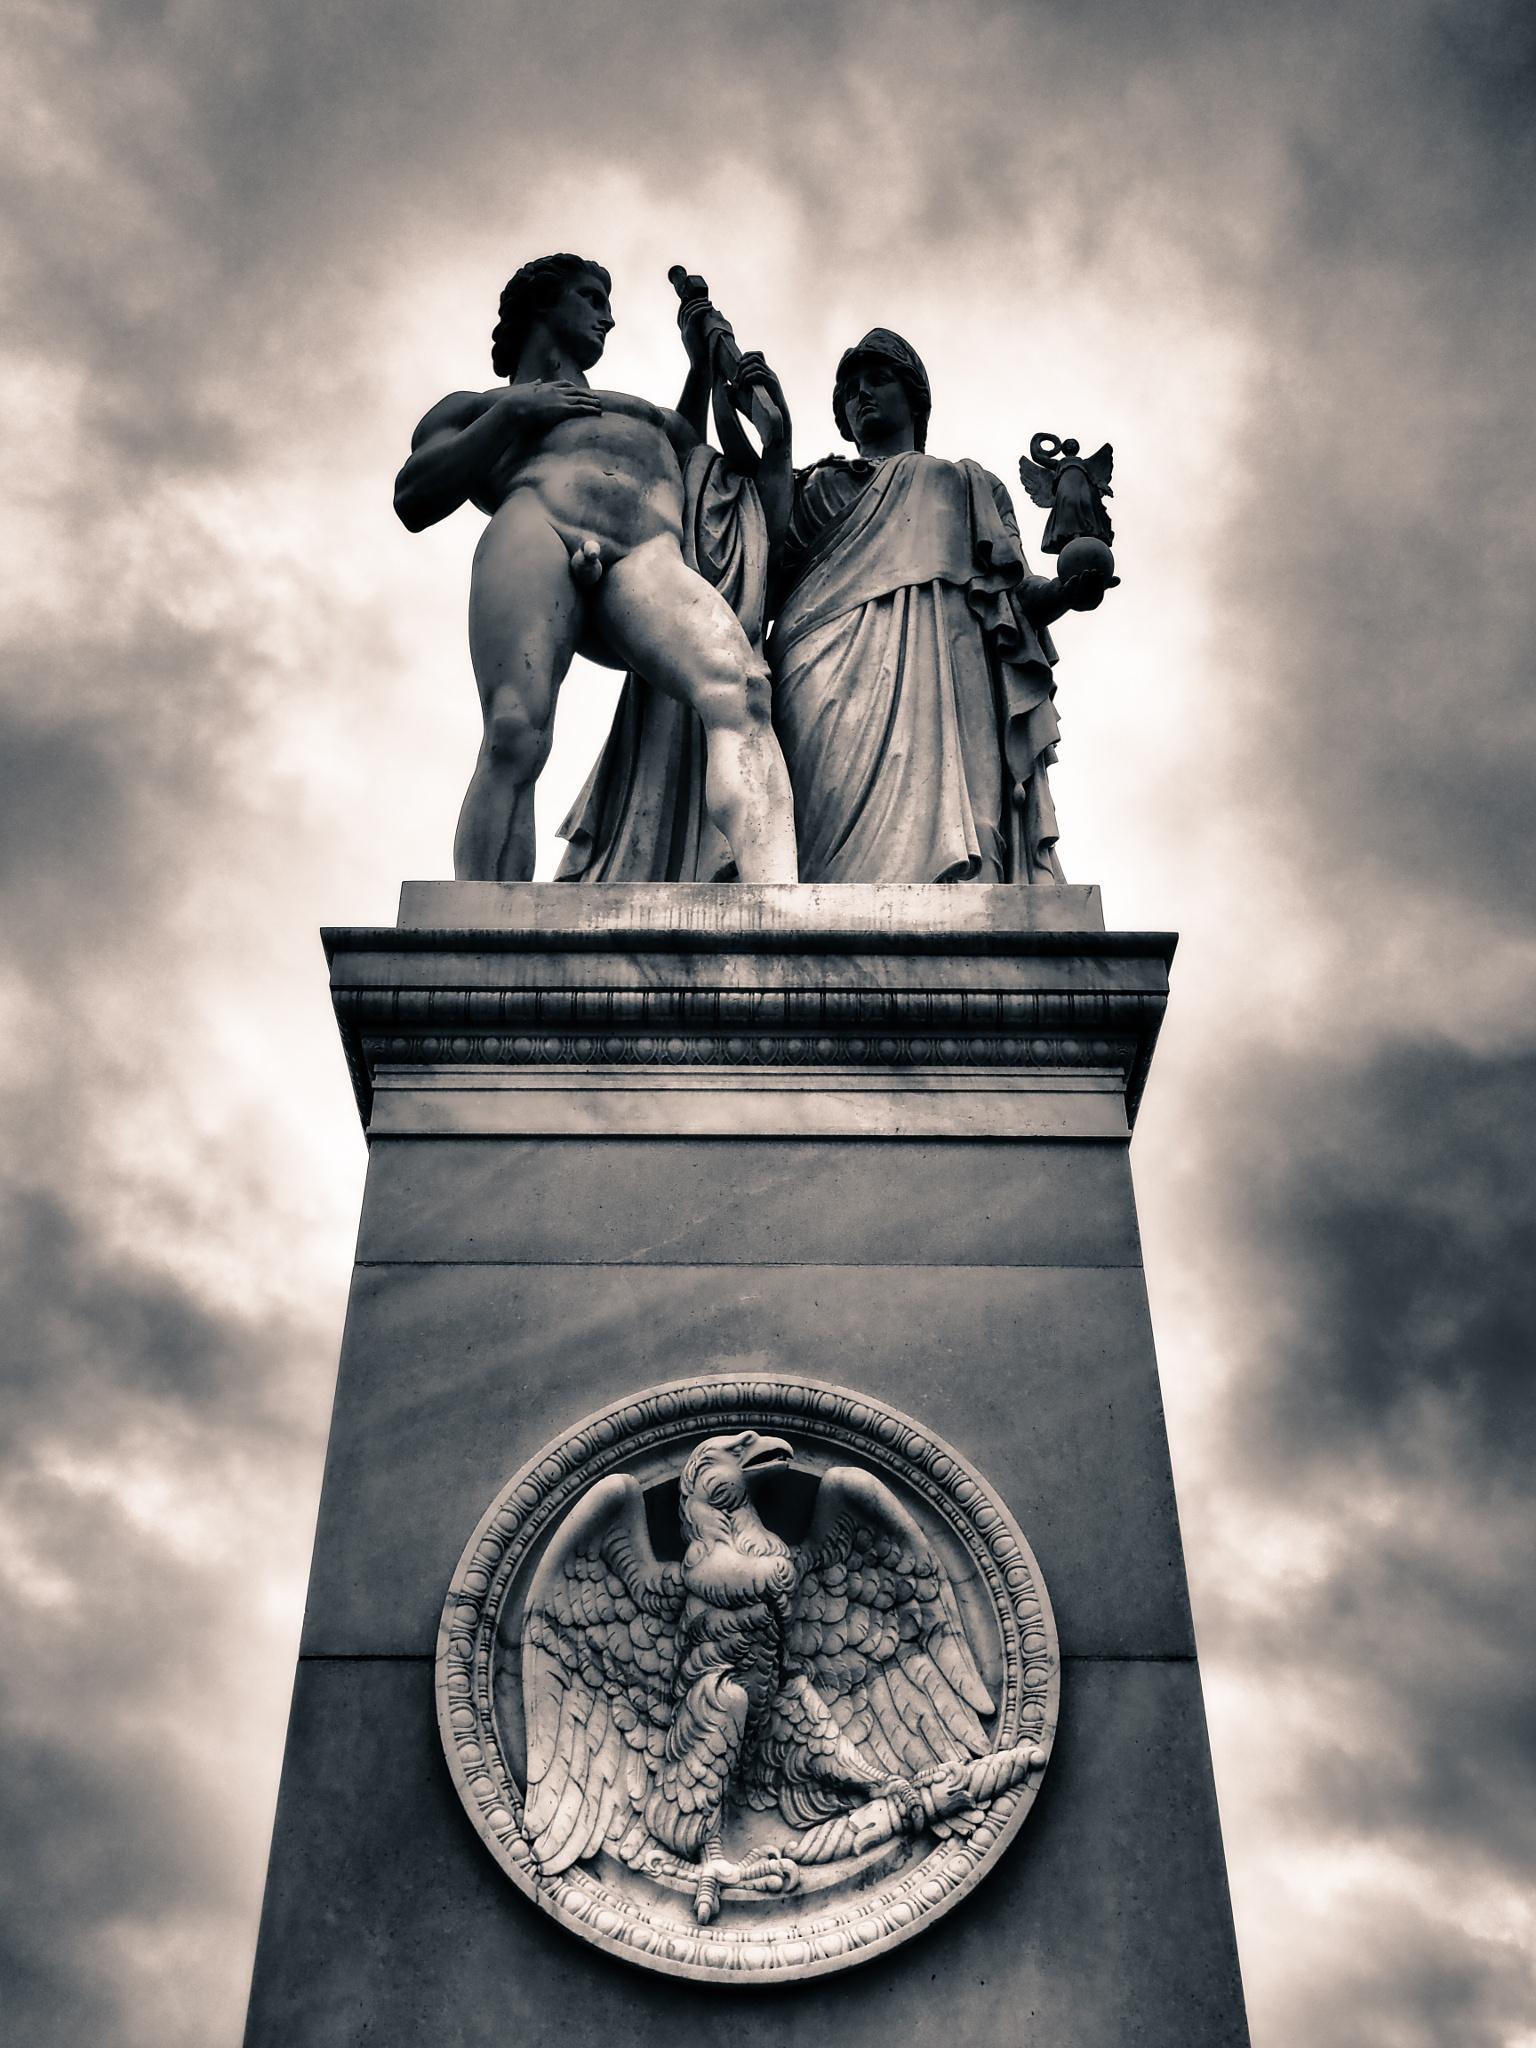 Berlin Bridge Statue Black & White by Jeans Brown Photography / Jens Schwarz